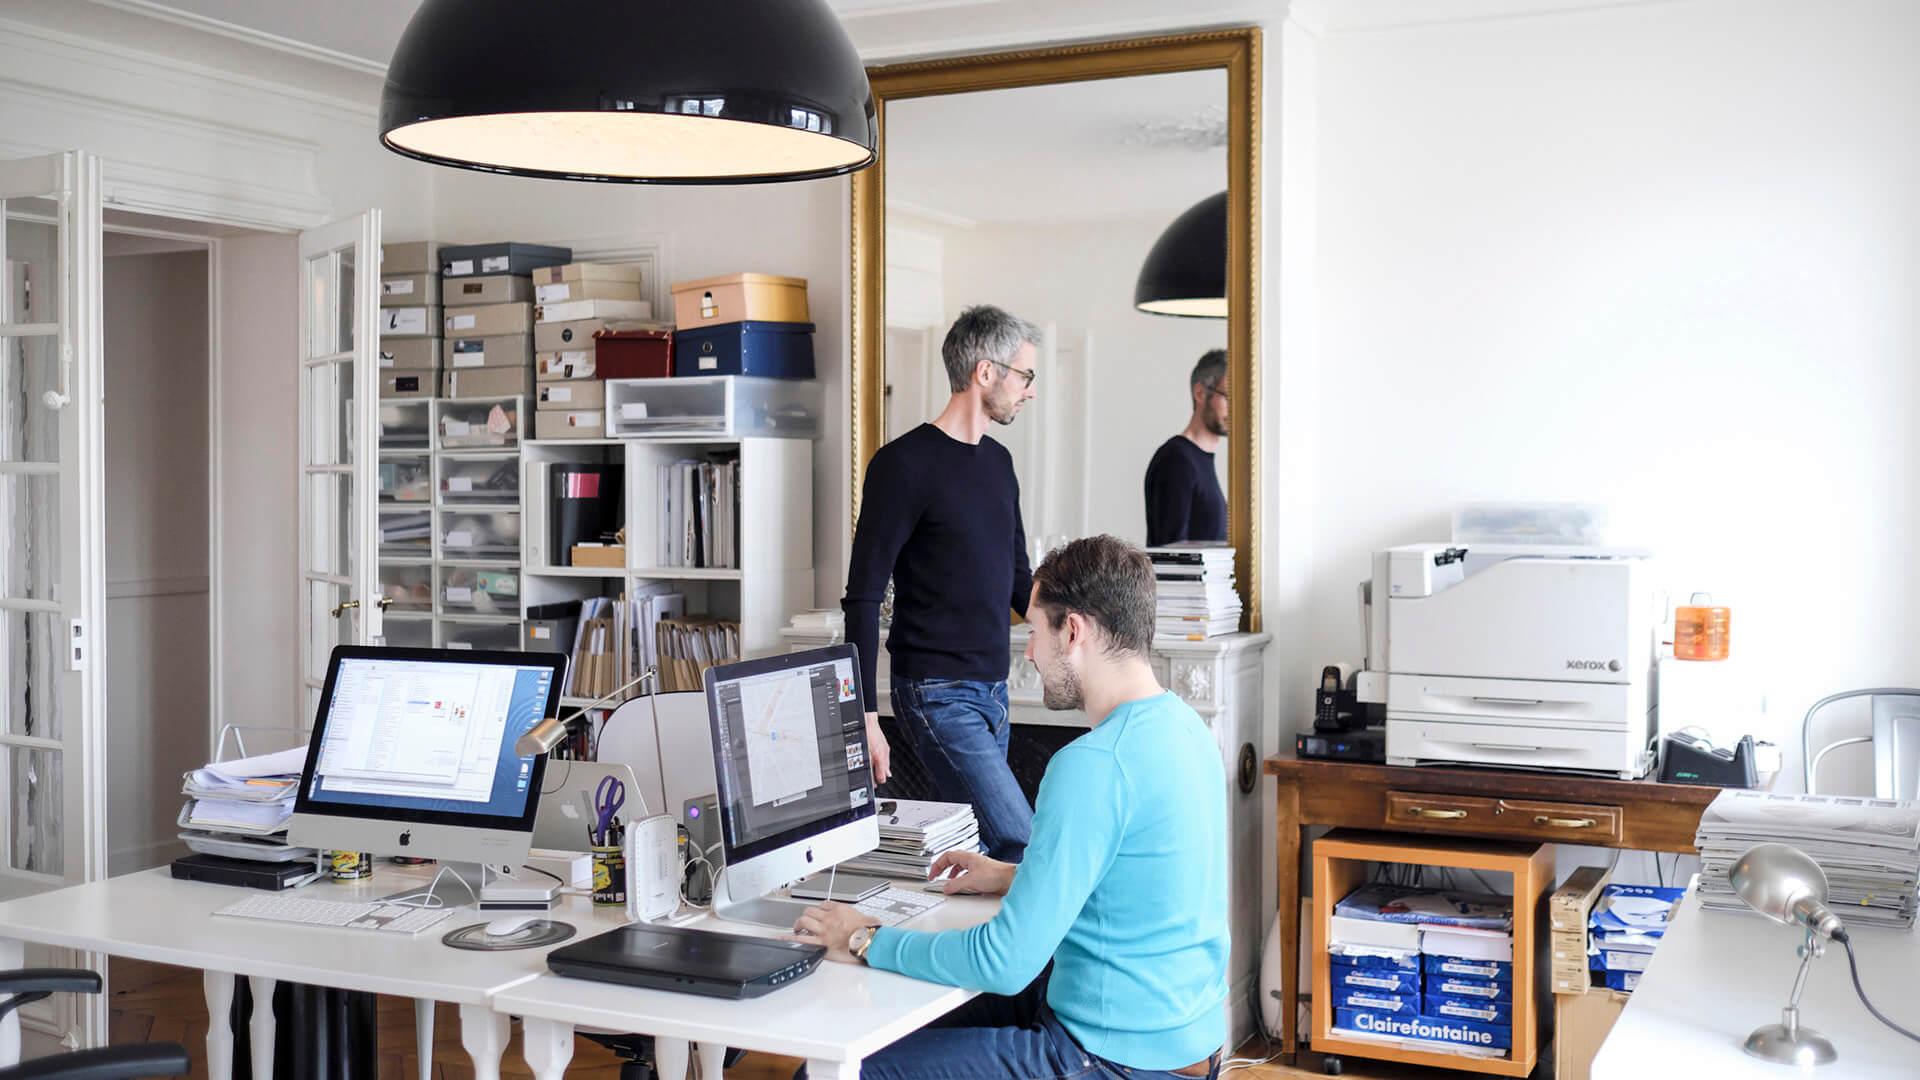 Agence - Sylvie Amar Studio